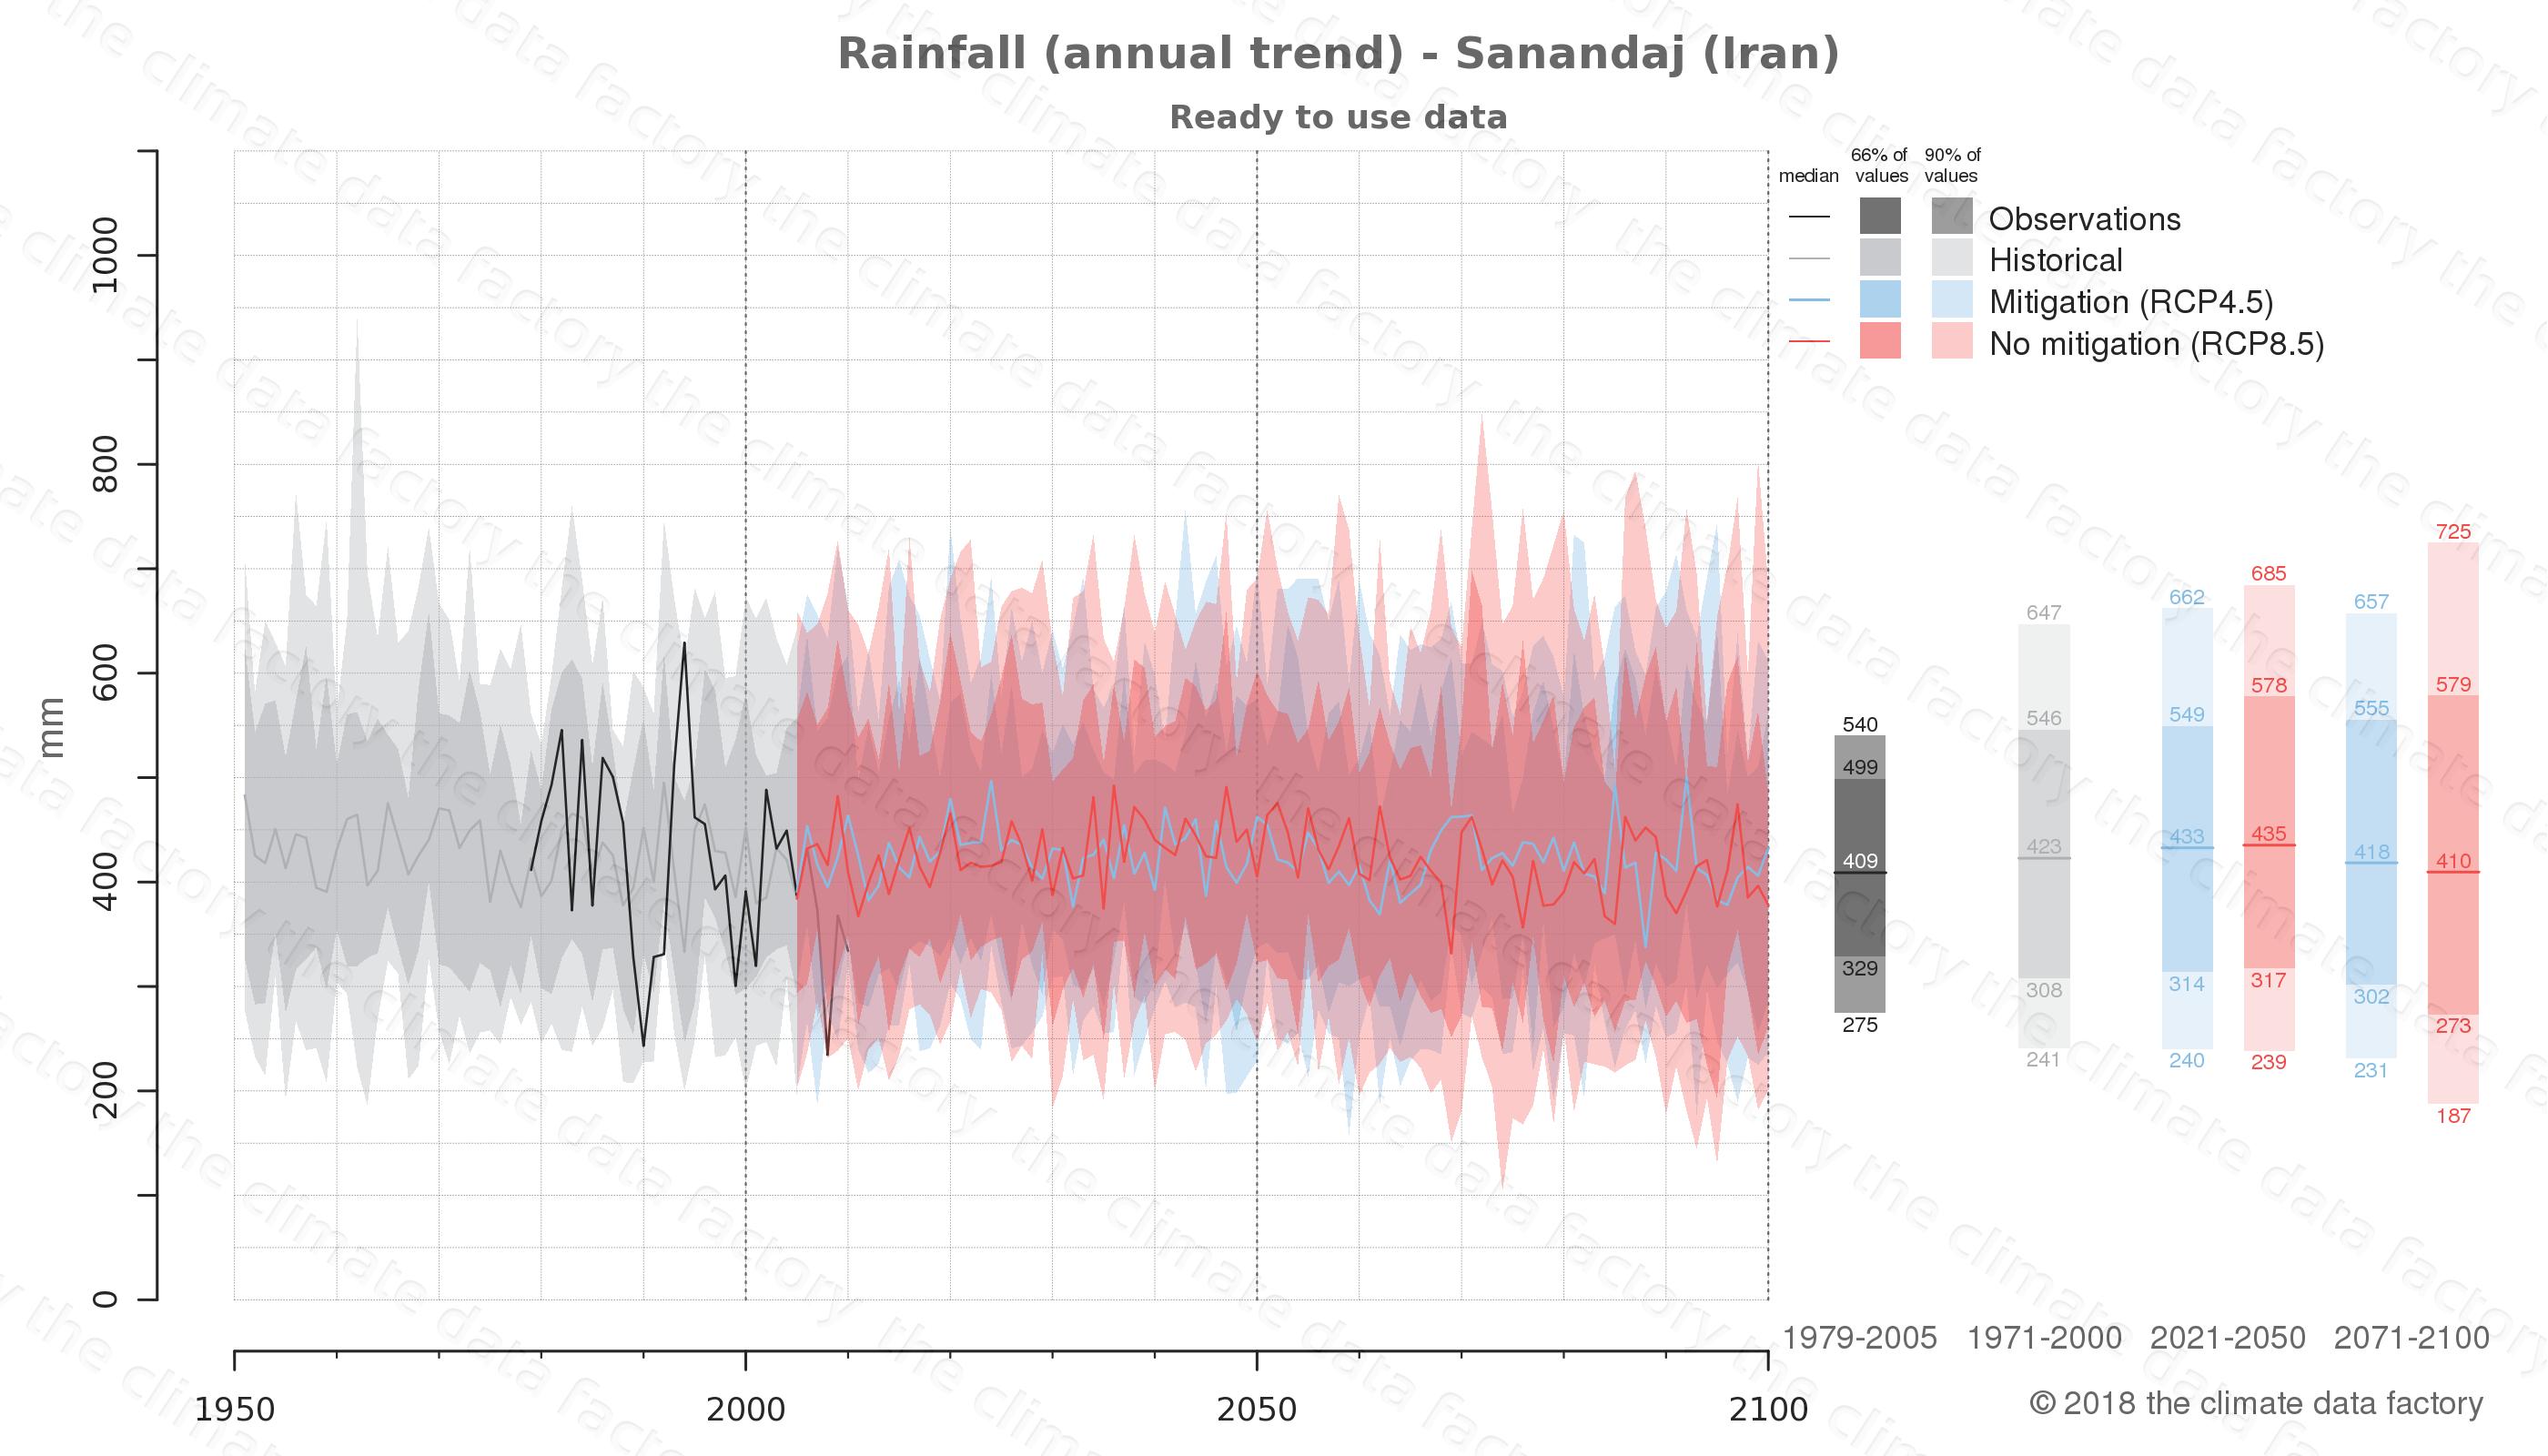 climate change data policy adaptation climate graph city data rainfall sanandaj iran